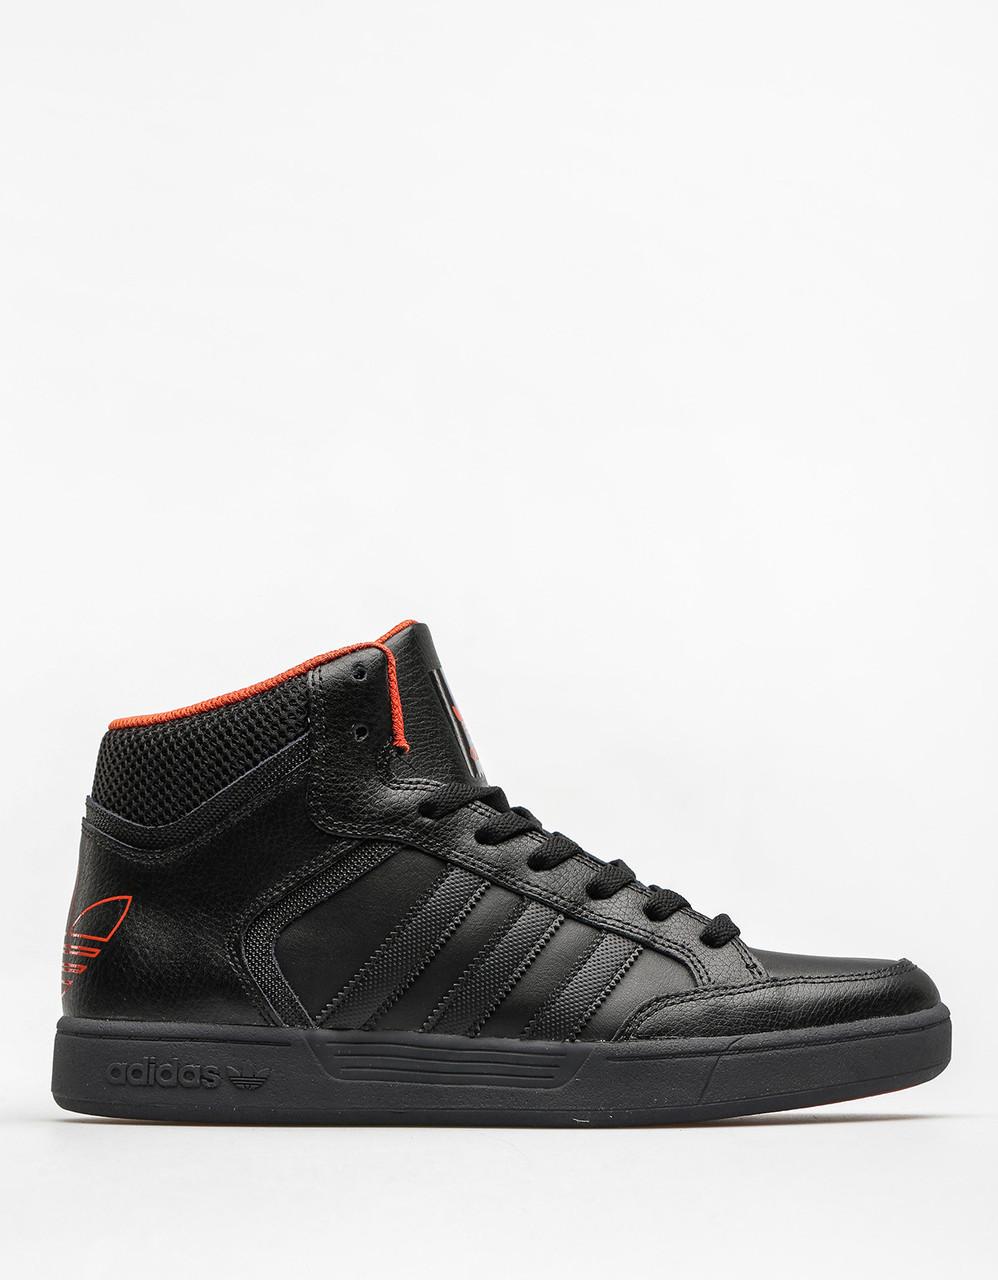 Кроссовки Adidas Varial Mid (BY4062) оригинал